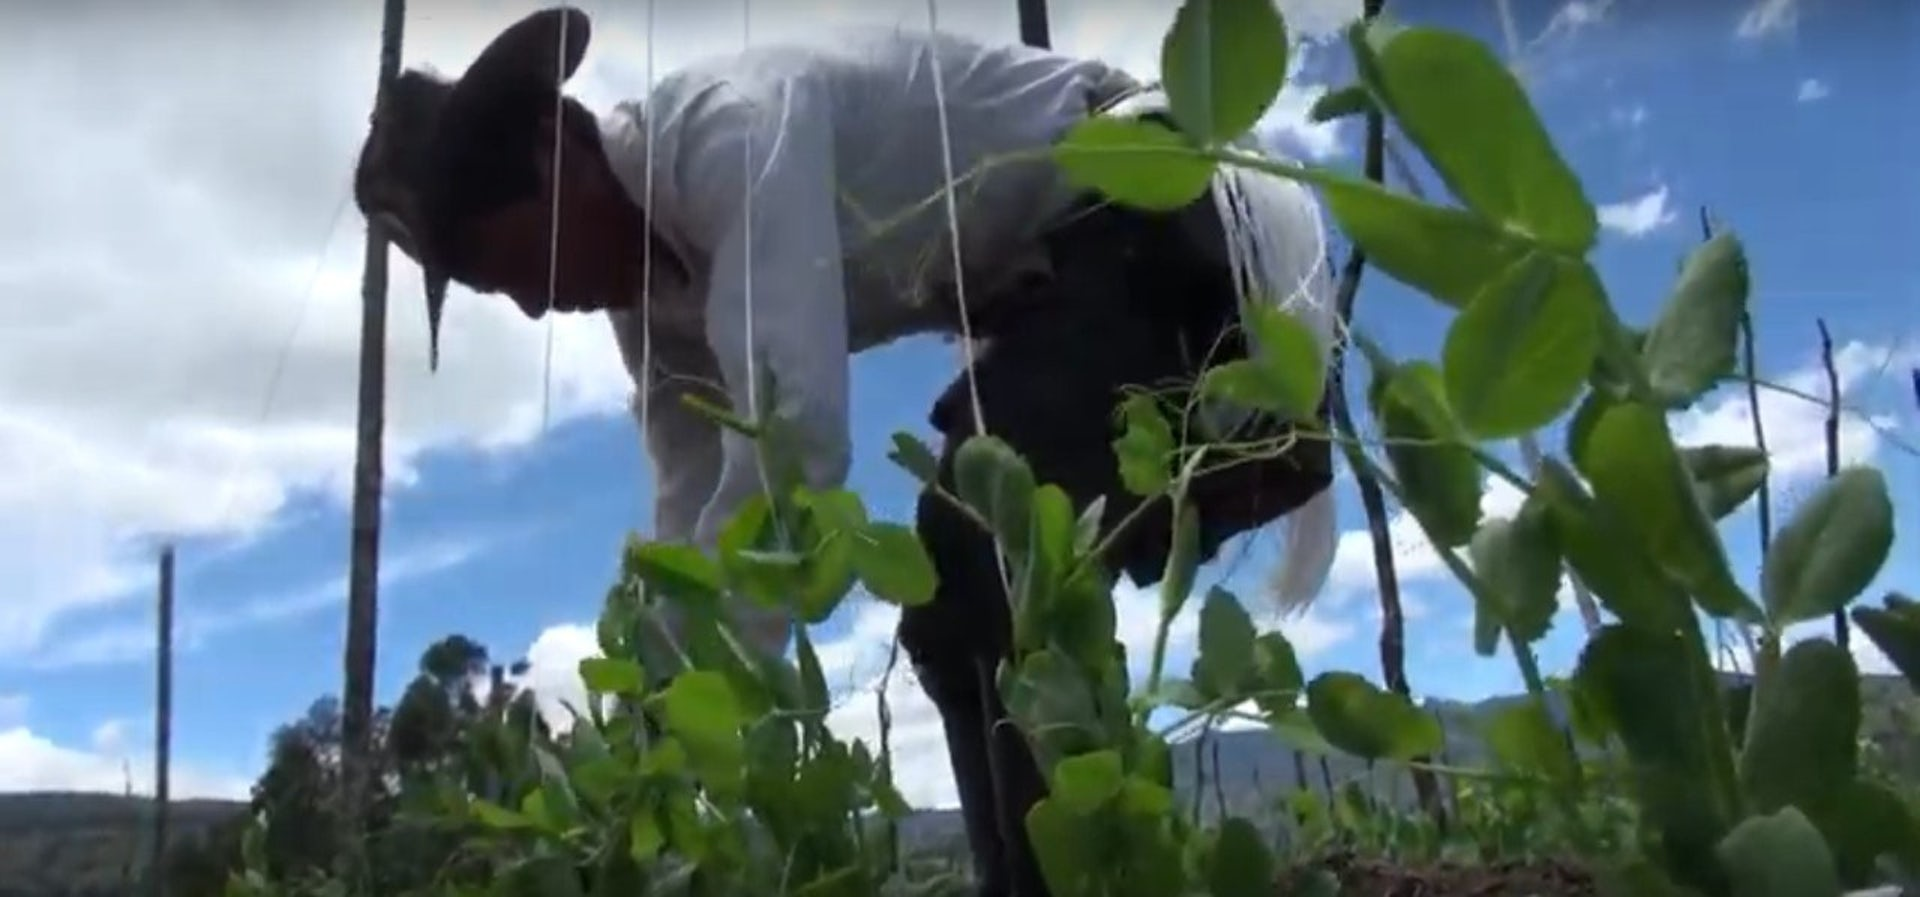 Agrosavia farmer